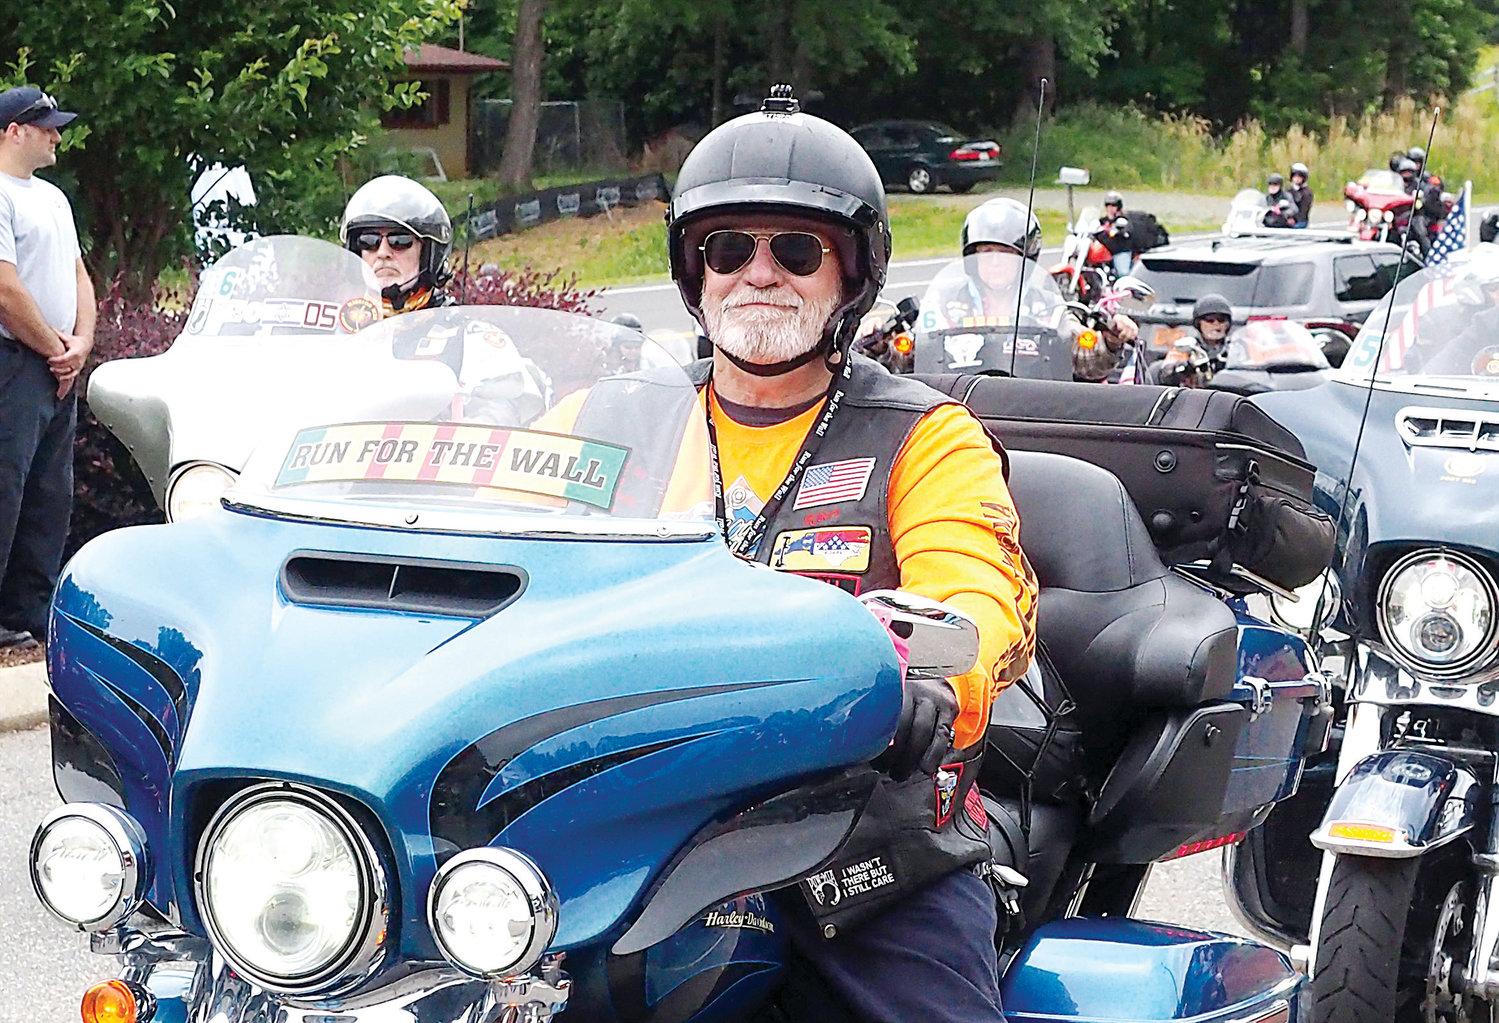 Army Helmet Black Soldiers Buffalo Soldier Motorcycle Helmet Open Face US